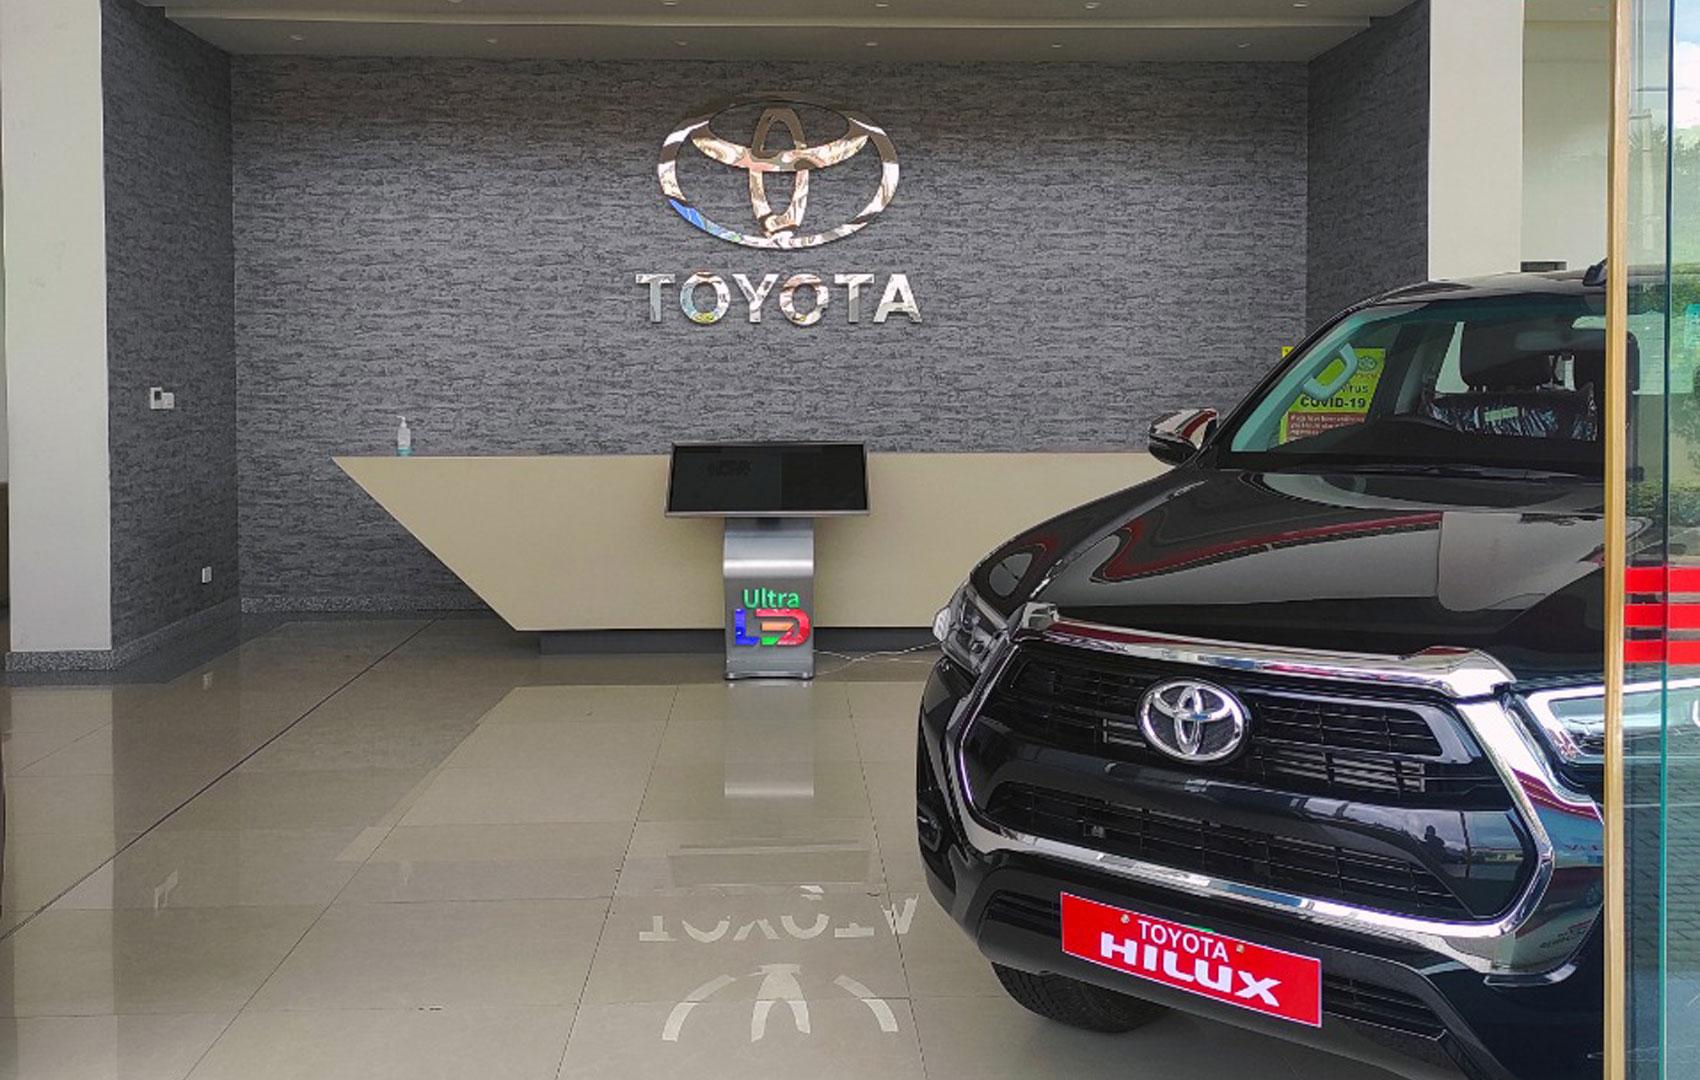 Toyota Standee